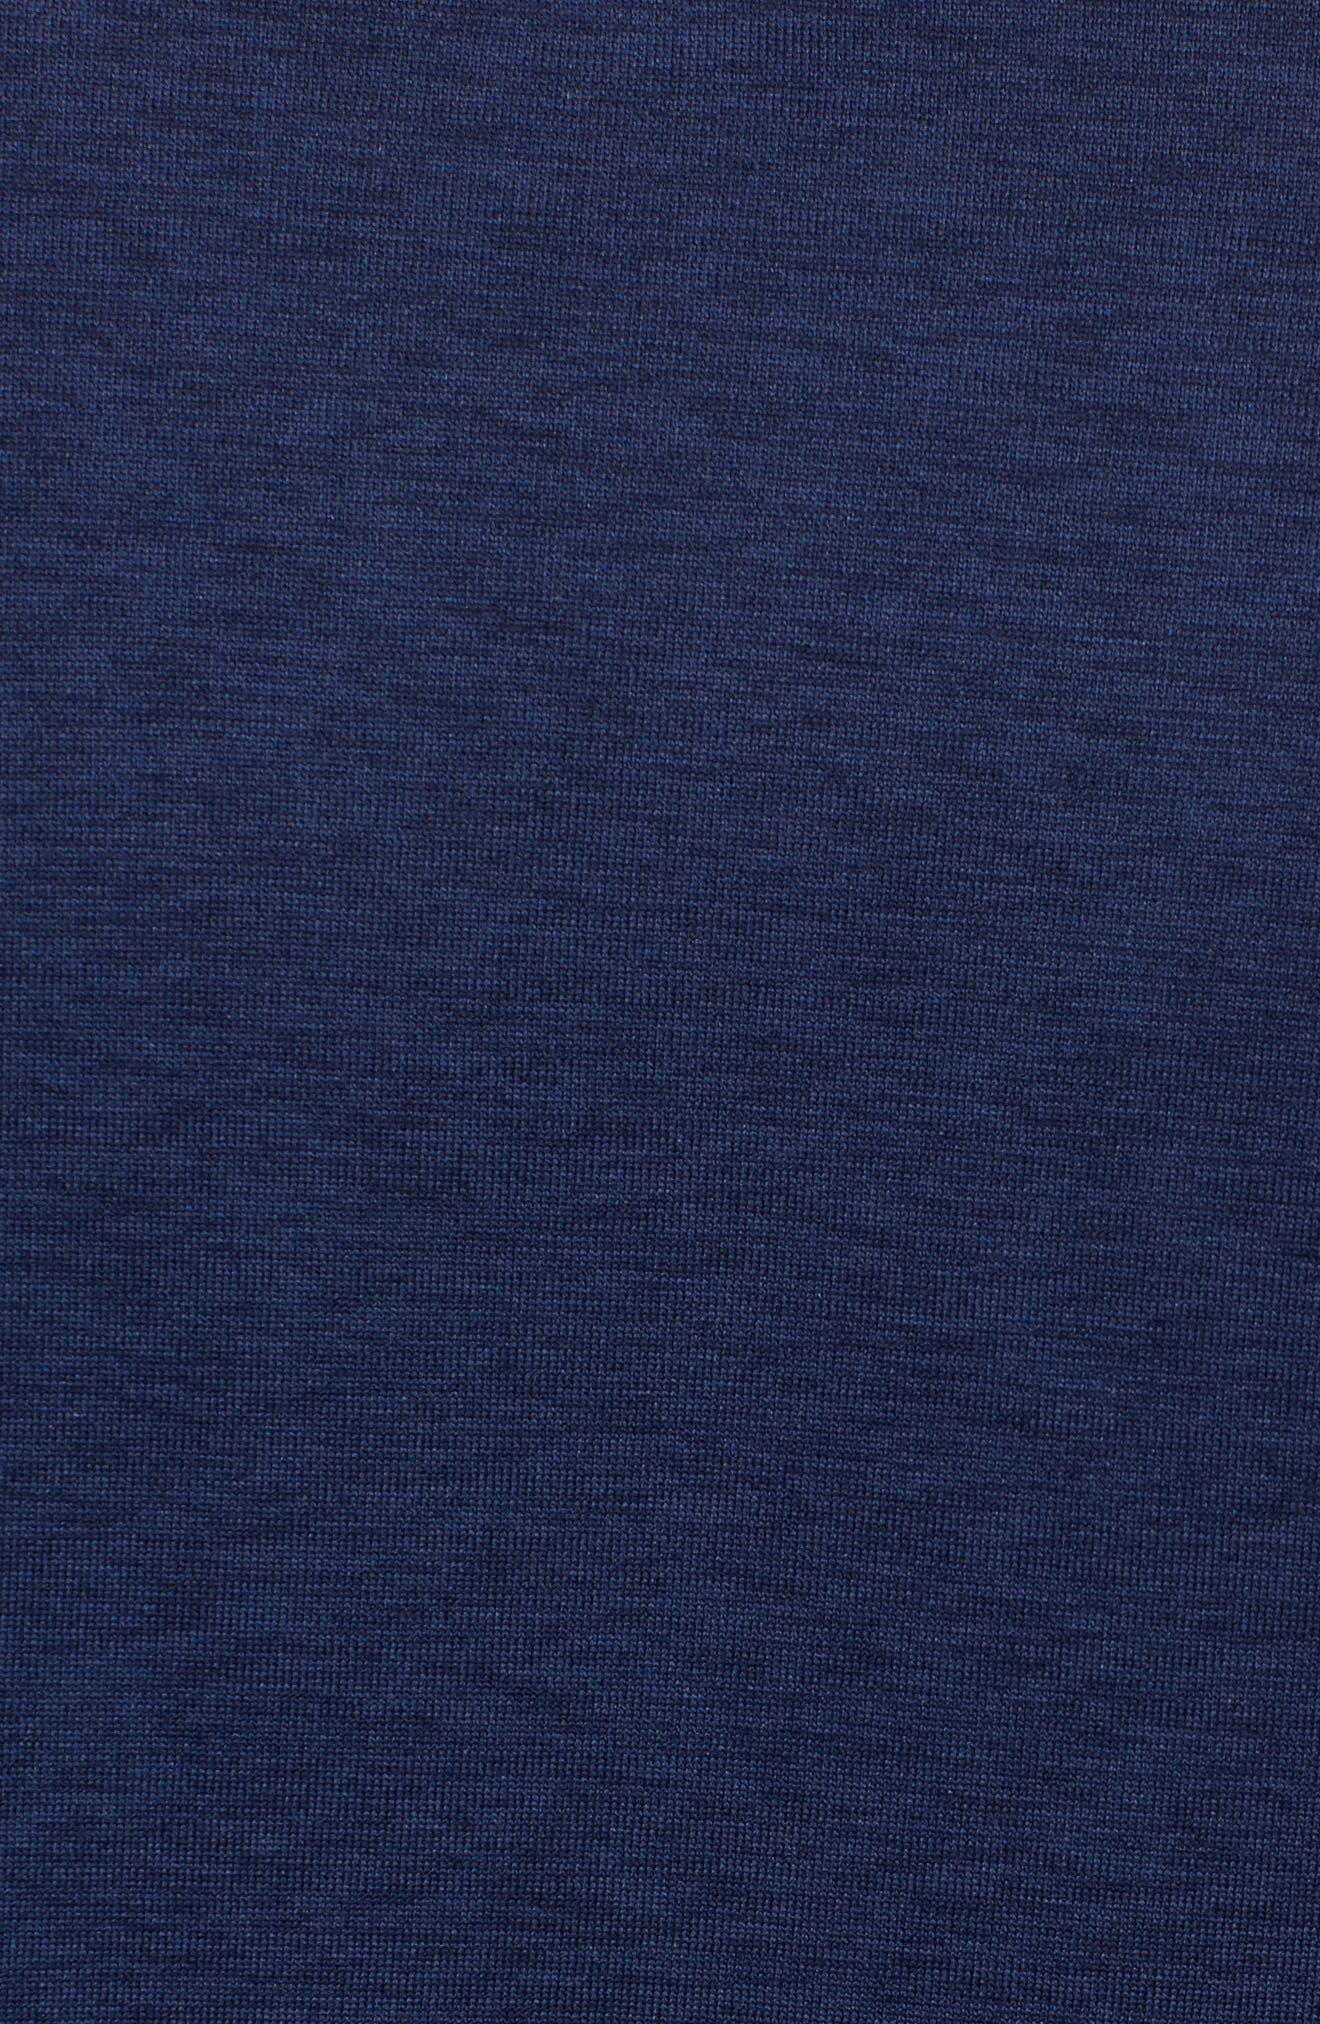 Hyper Dry Training Tee,                             Alternate thumbnail 5, color,                             Binary Blue/ Black/ Black